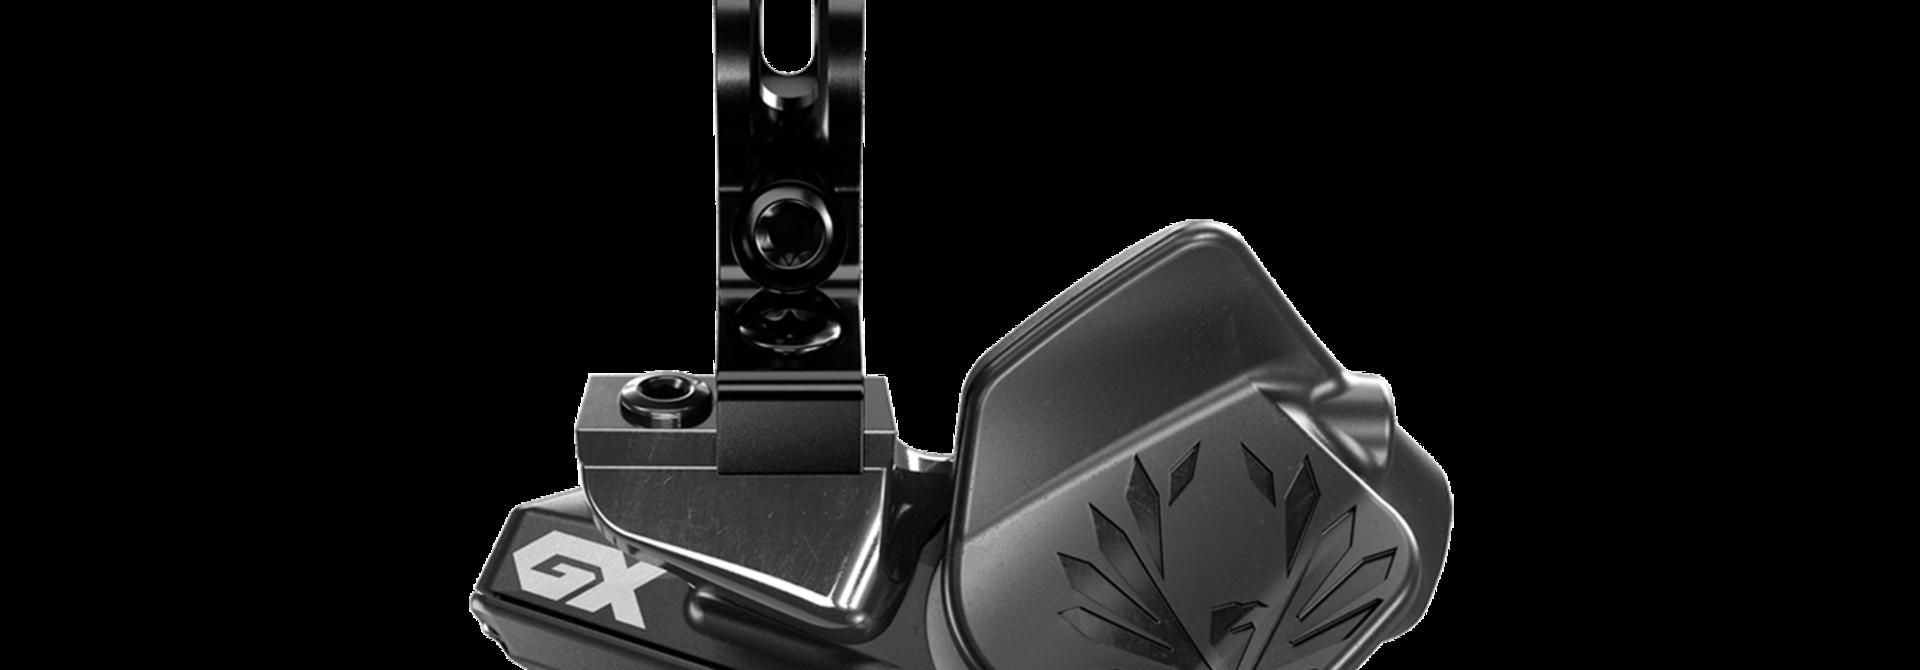 SRAM GX Eagle AXS Two Button Right Hand Shift Lever